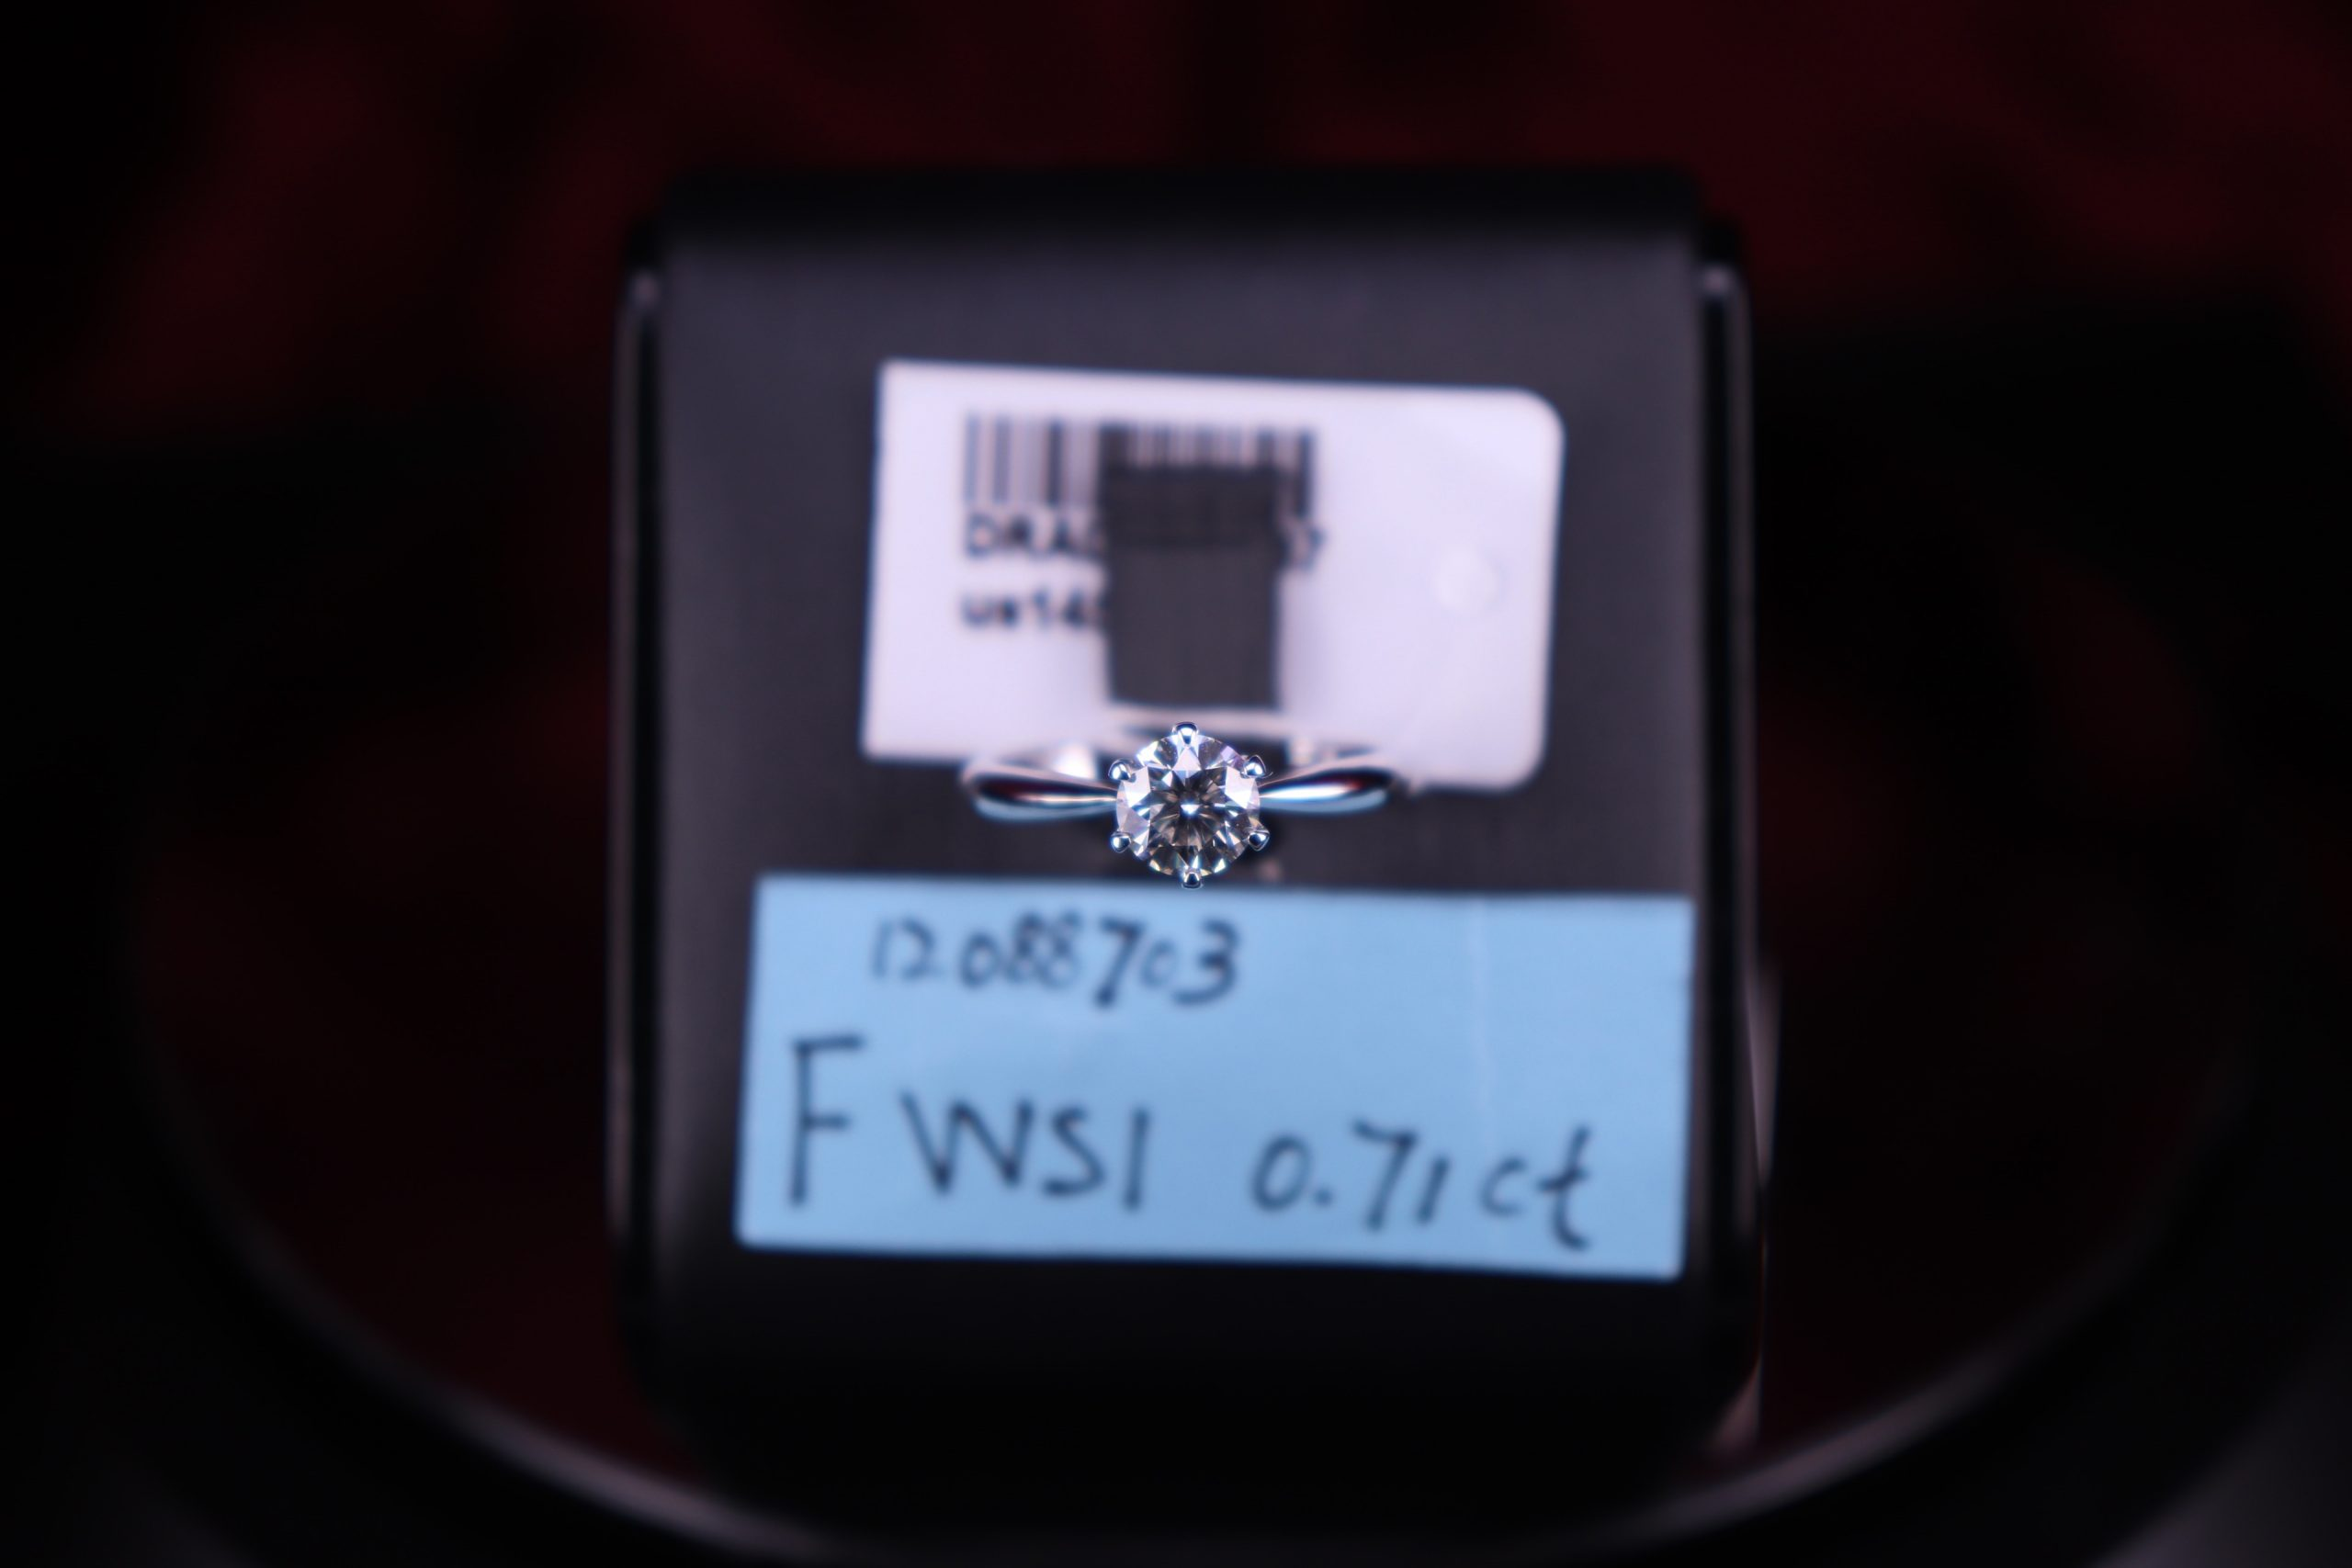 F VVS1 0.71ct